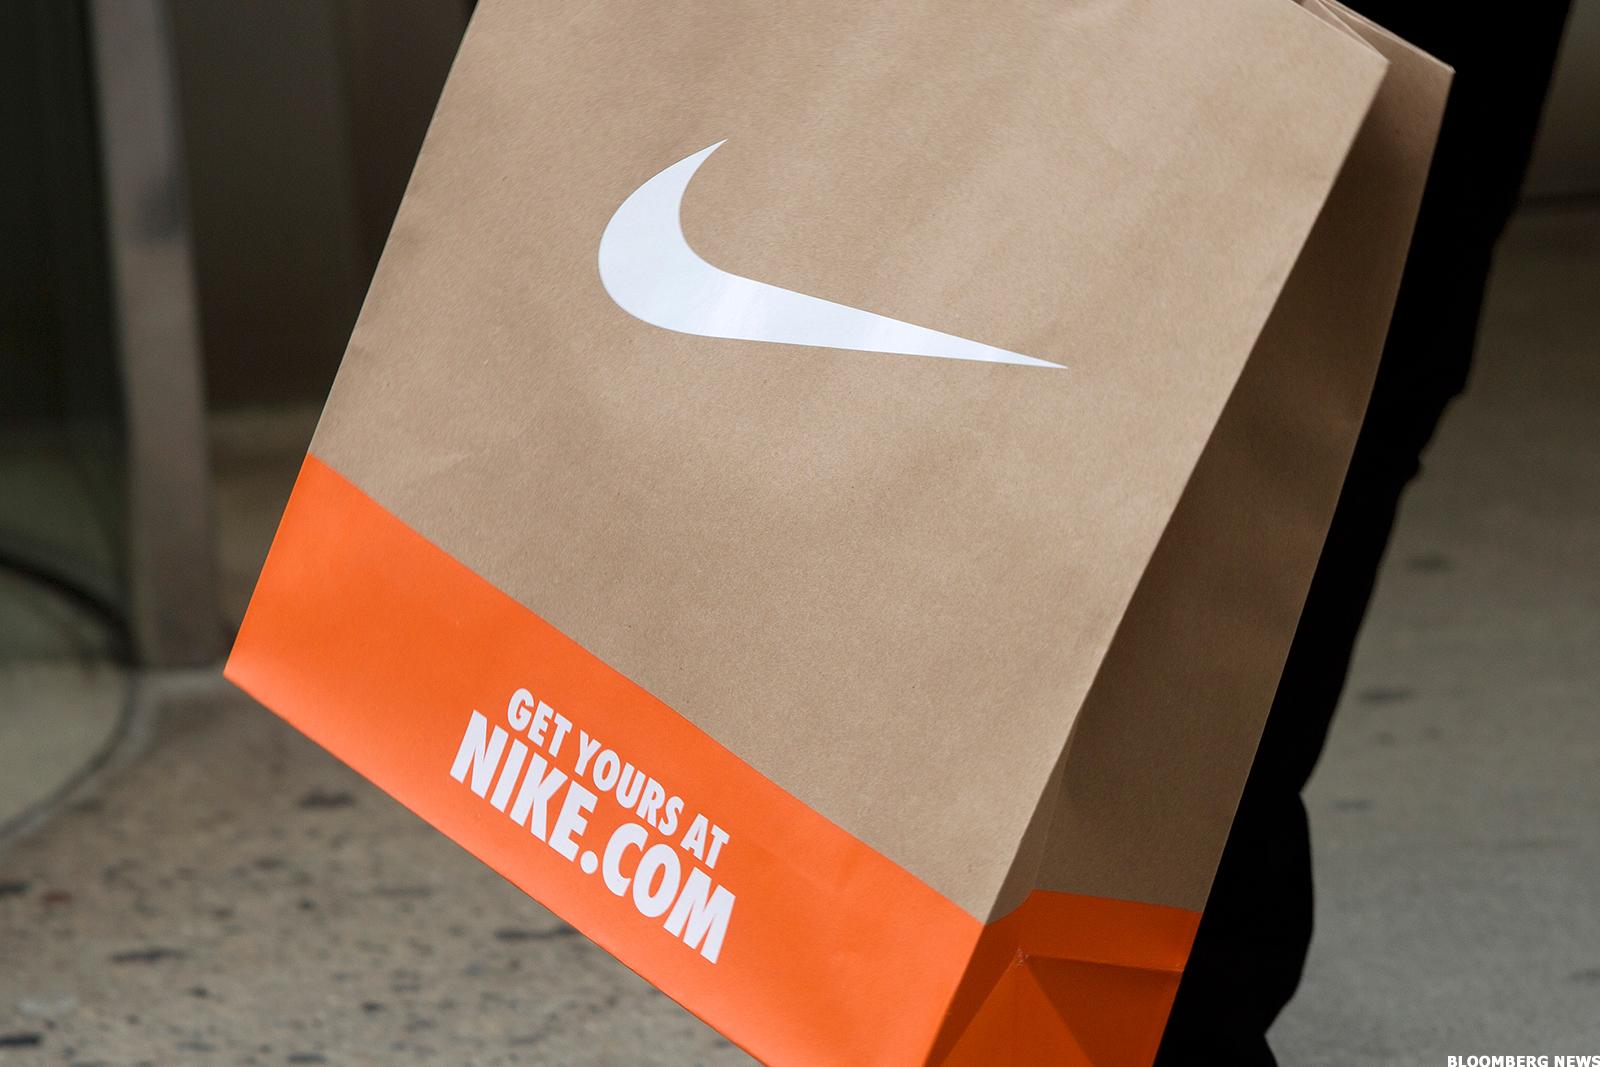 Nike (NKE) Stock Down, Releasing Self-Lacing Shoes in November ...